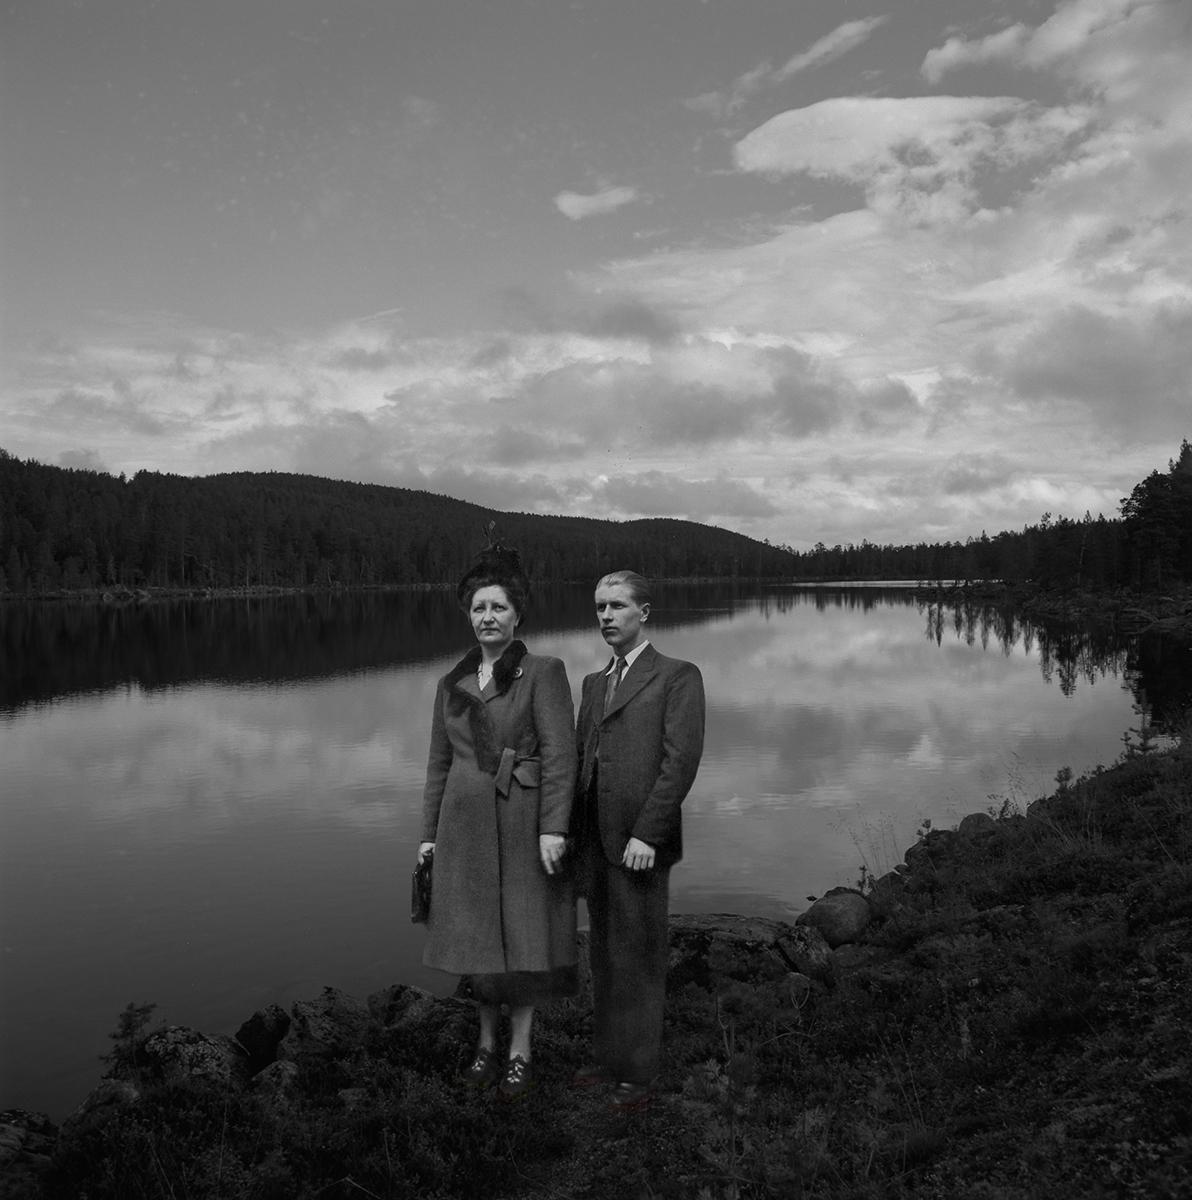 Elsa and Erkki at the Lake (large view)